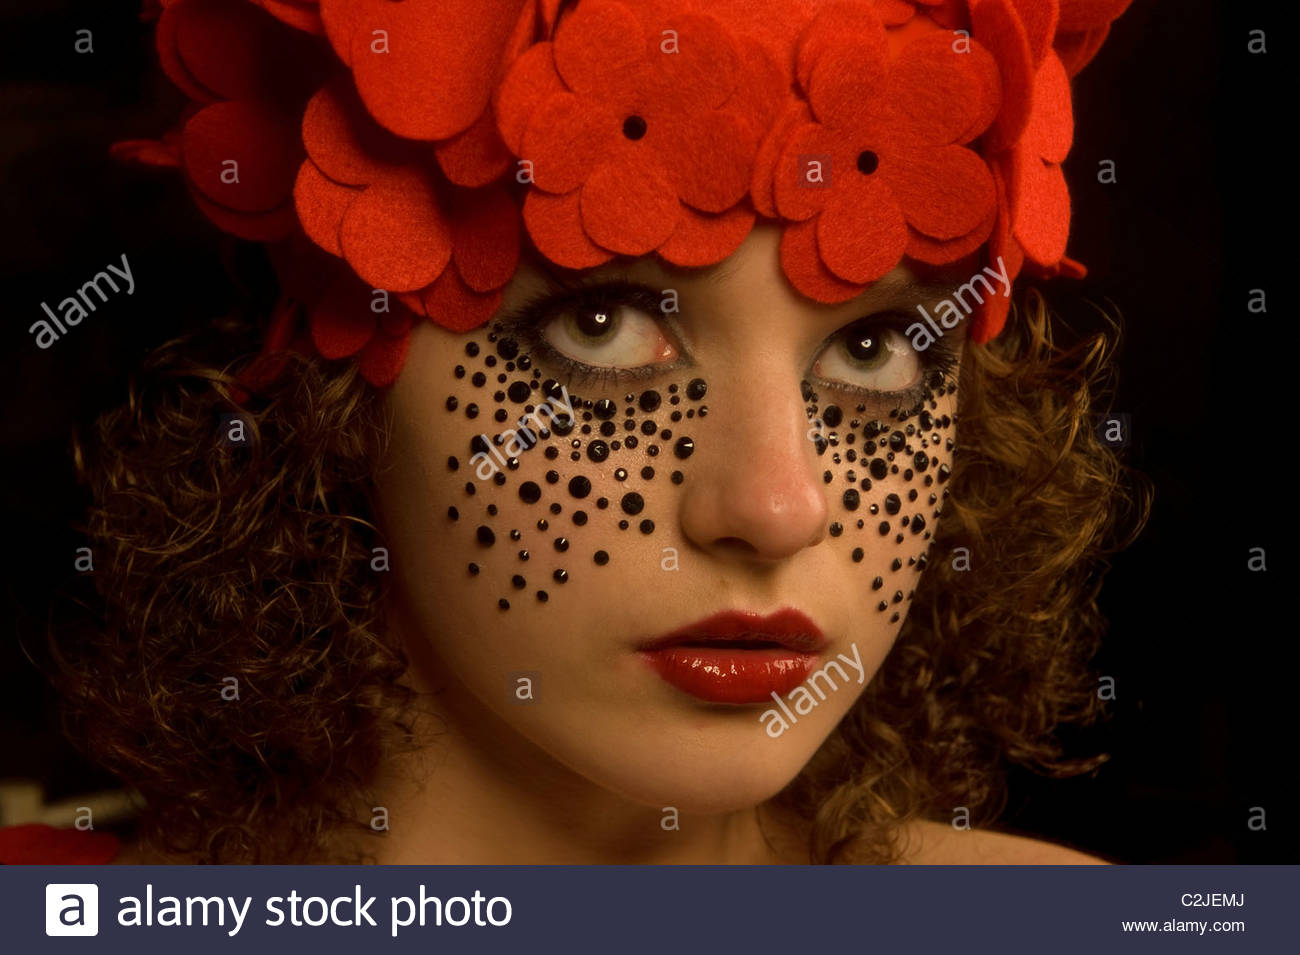 Cheeky Young Girl - Stock Image